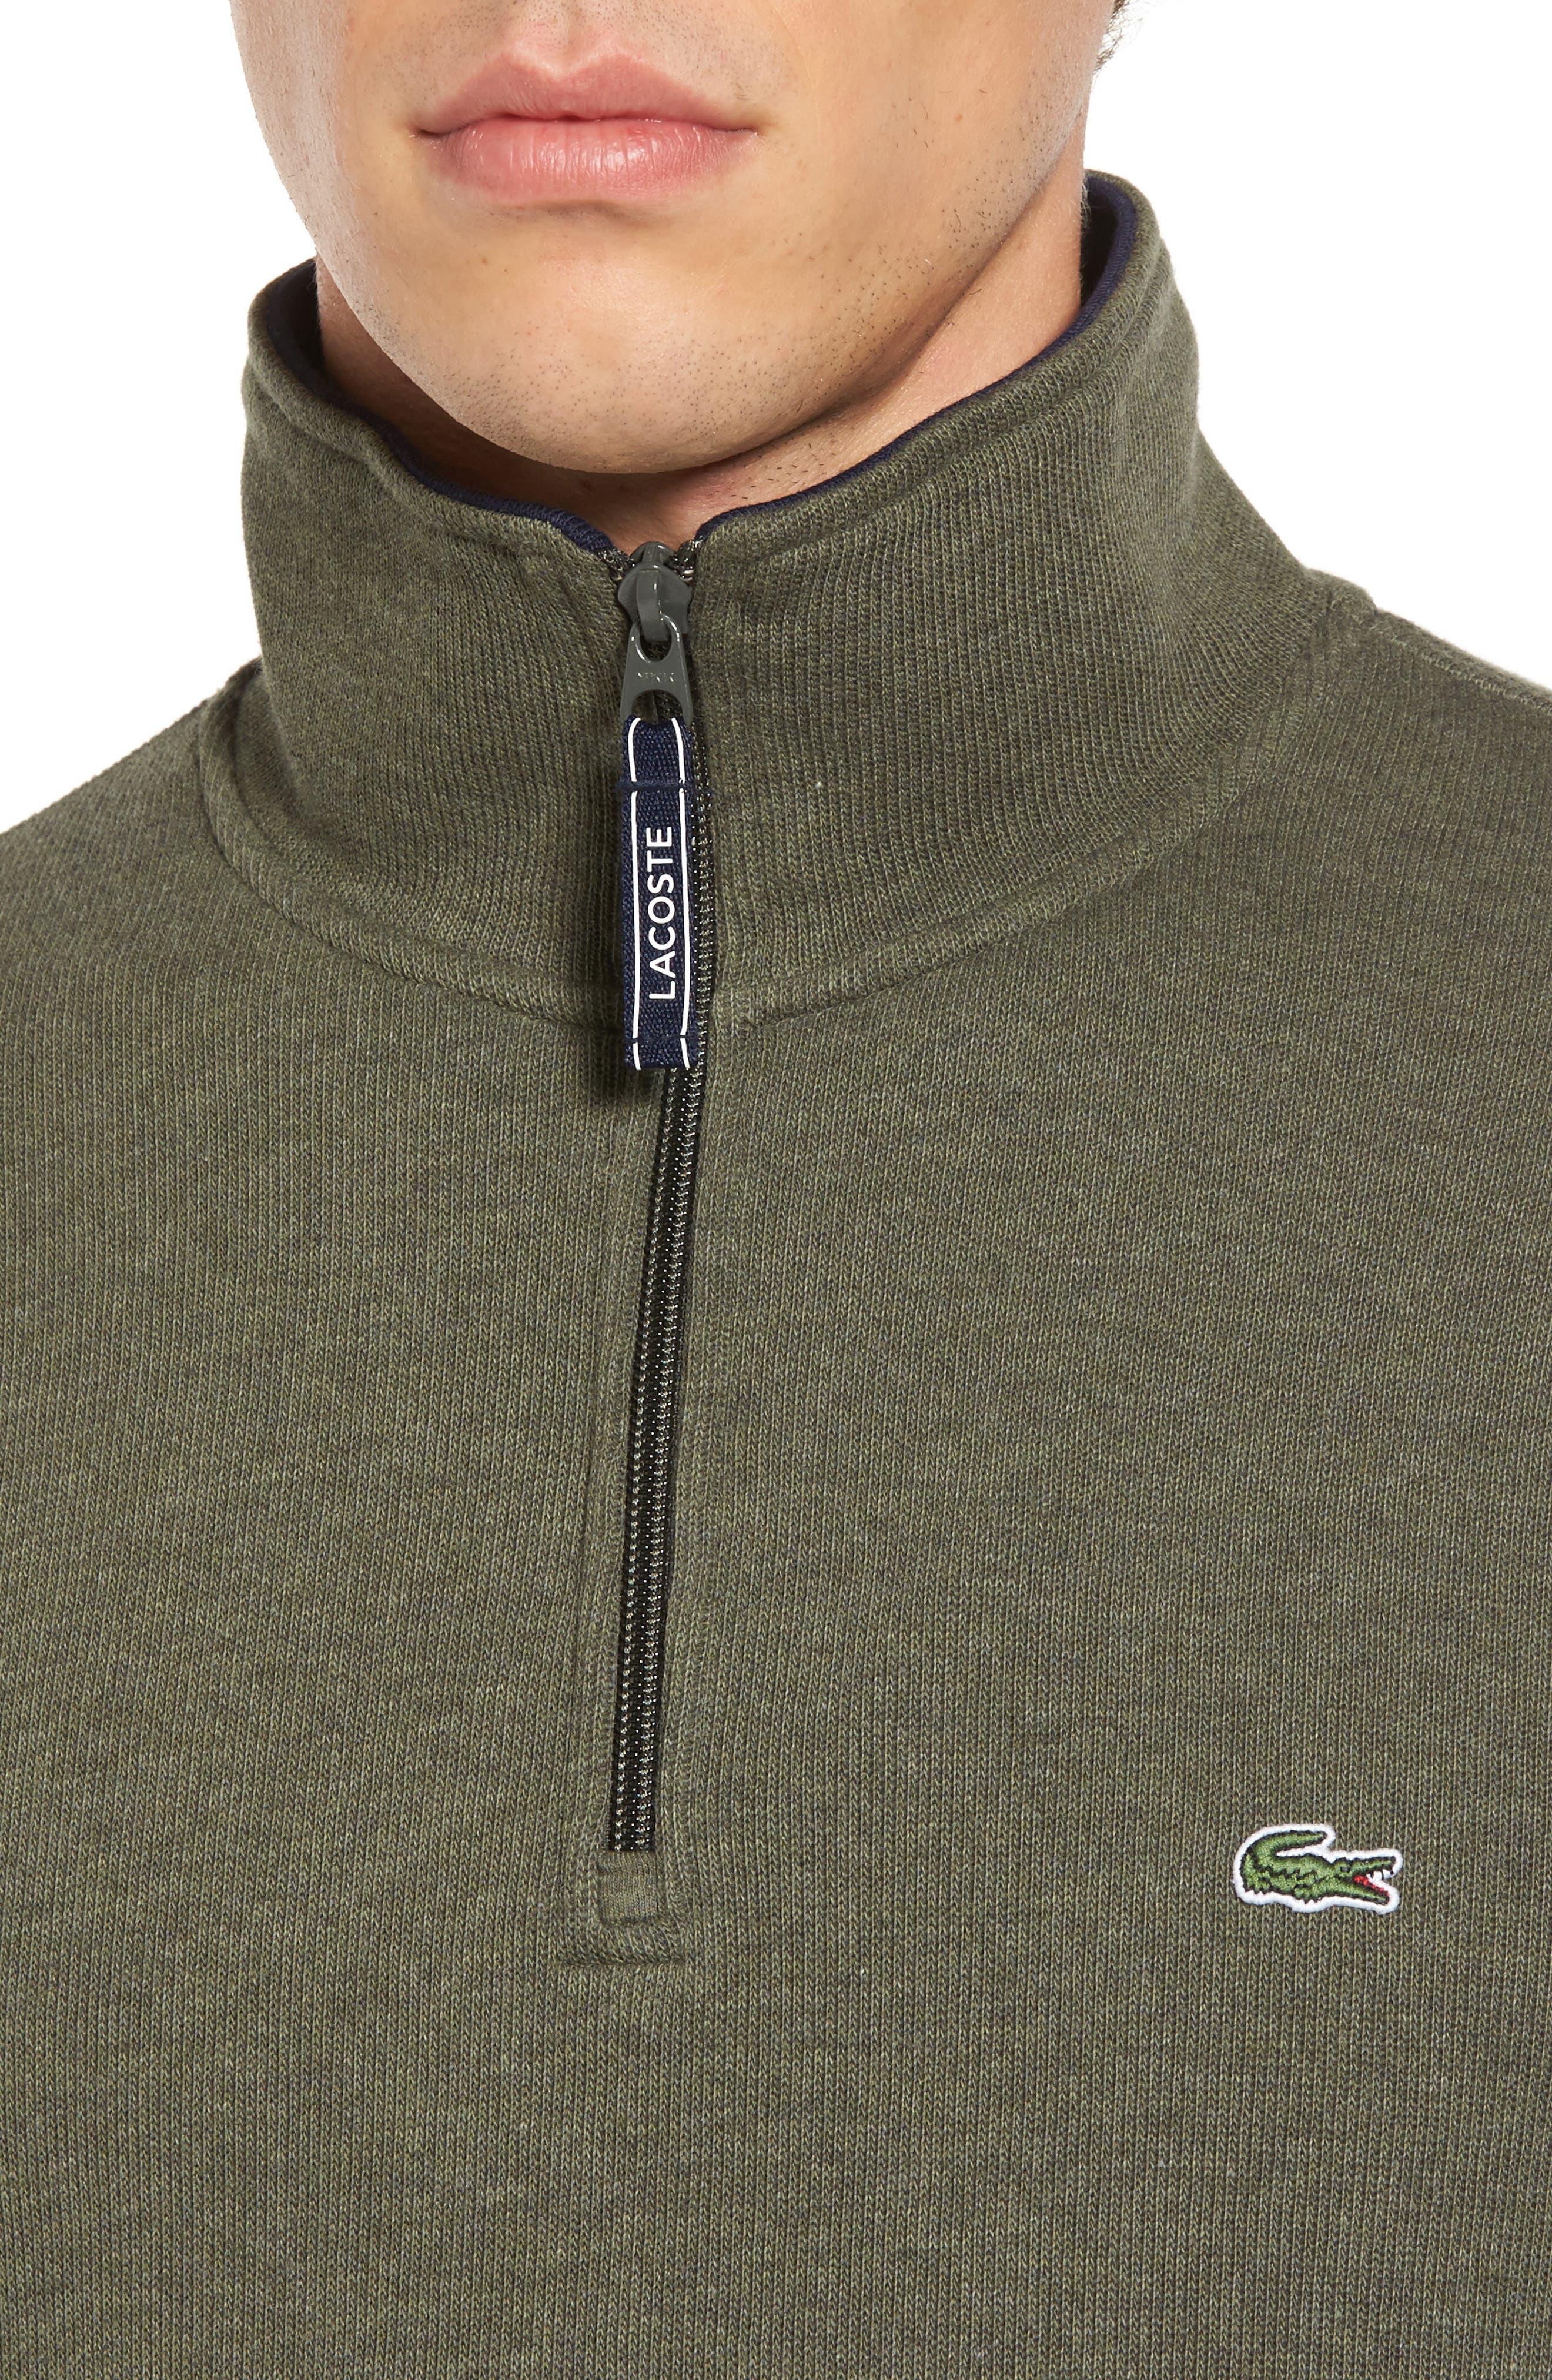 Quarter Zip Sweatshirt,                             Alternate thumbnail 4, color,                             2Qh Army/ Navy Blue